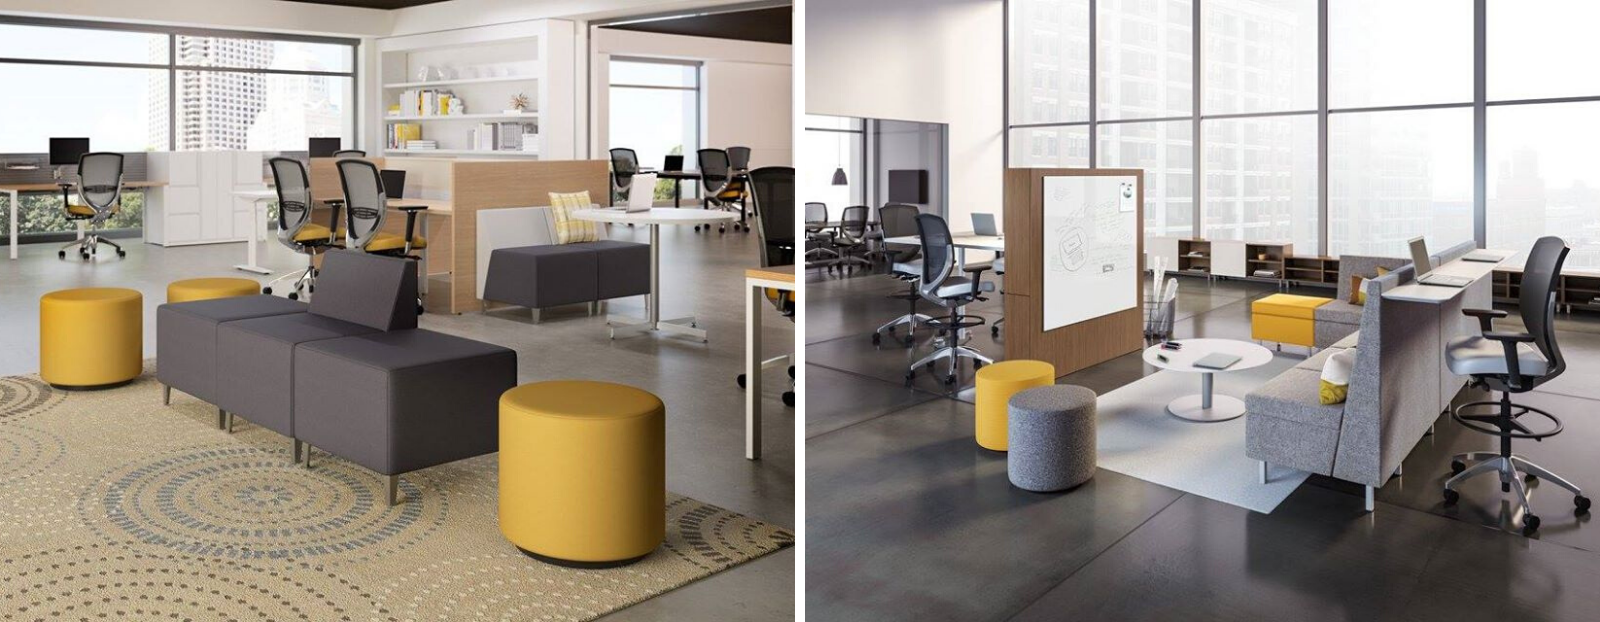 Working Spaces Header Image